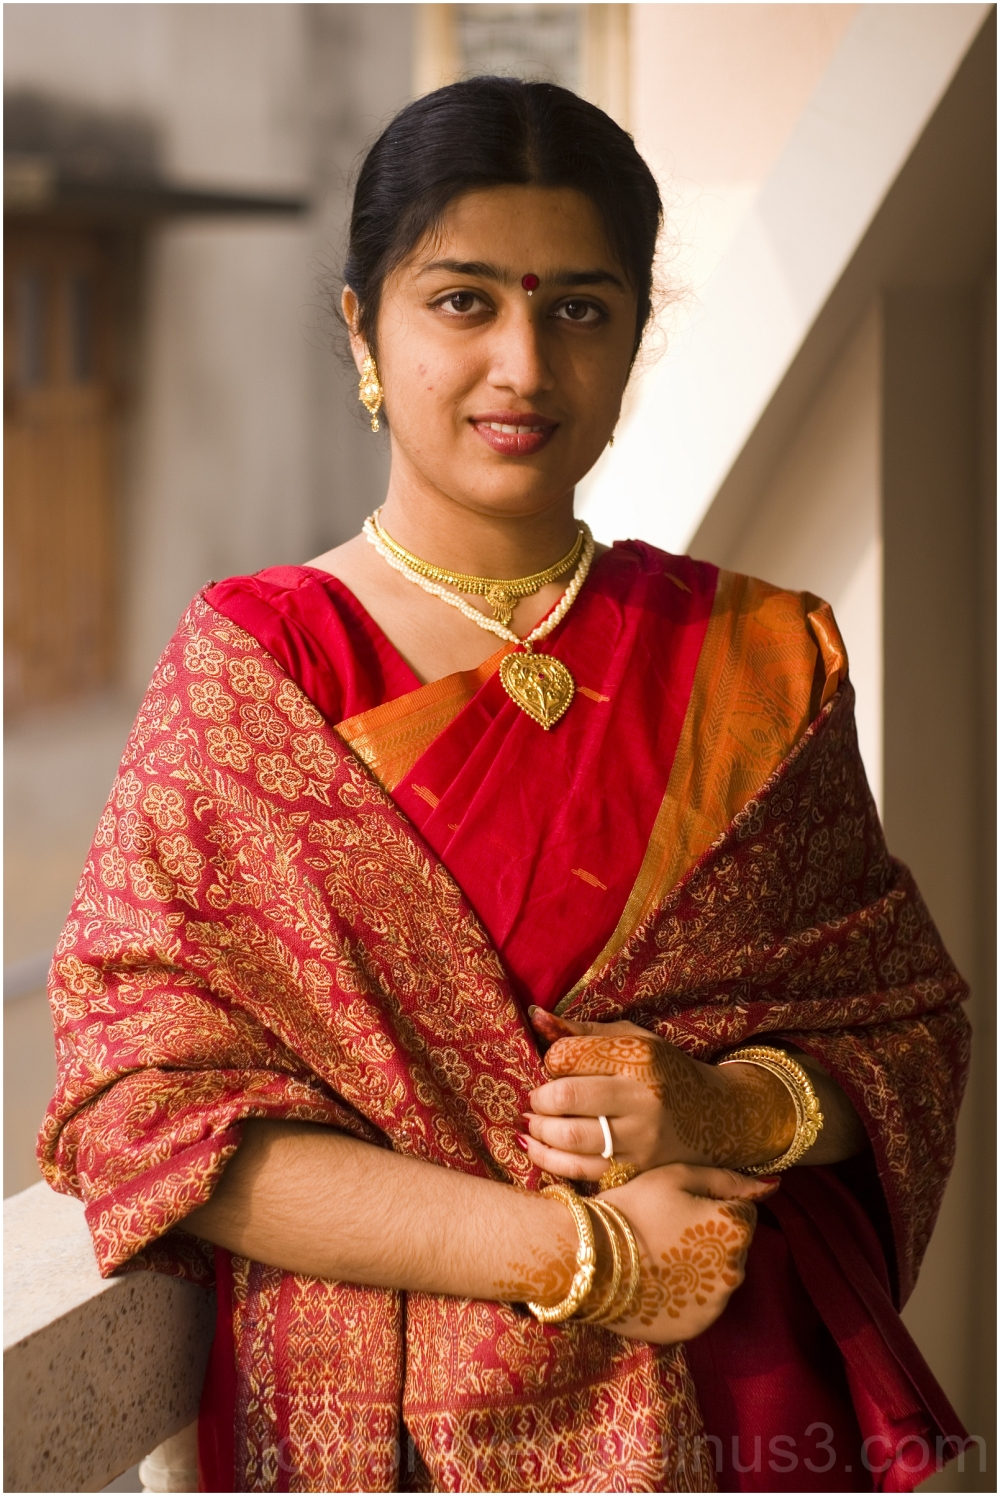 Jolly girl portrait red sari wedding woman balcony